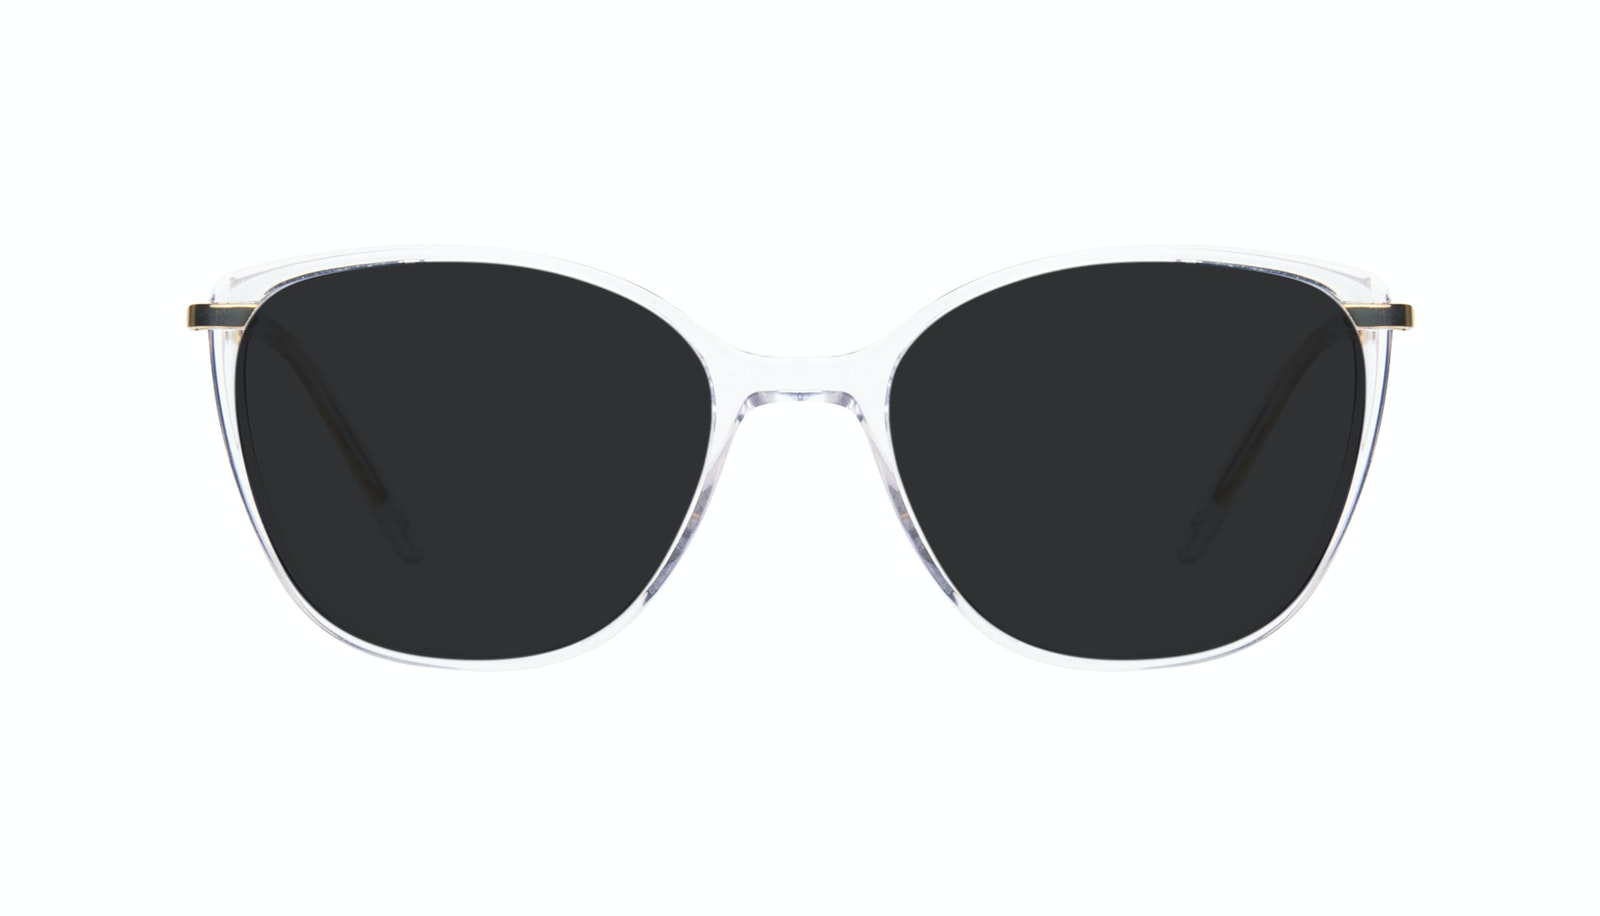 Affordable Fashion Glasses Rectangle Square Sunglasses Women Illusion Gold Diamond